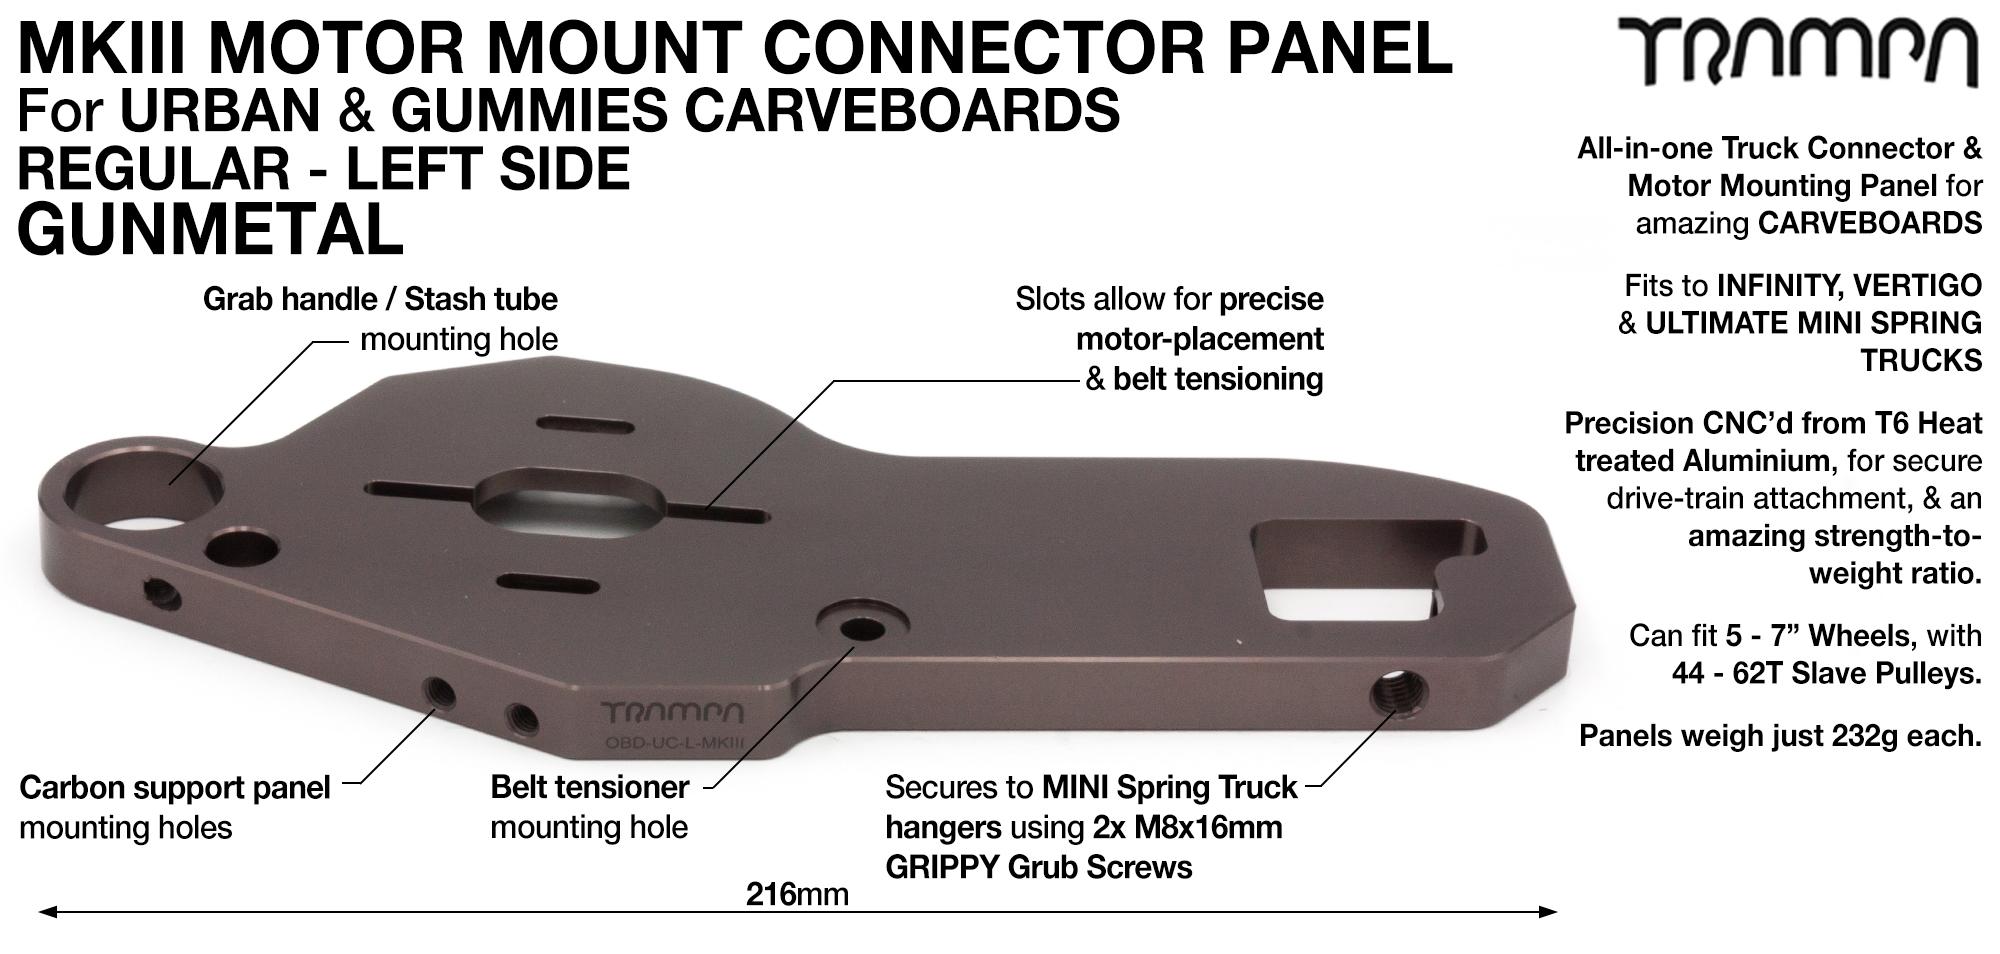 MkIII CARVE Truck Motor Mount T6 Aluminium Anodised - REGULAR GUNMETAL